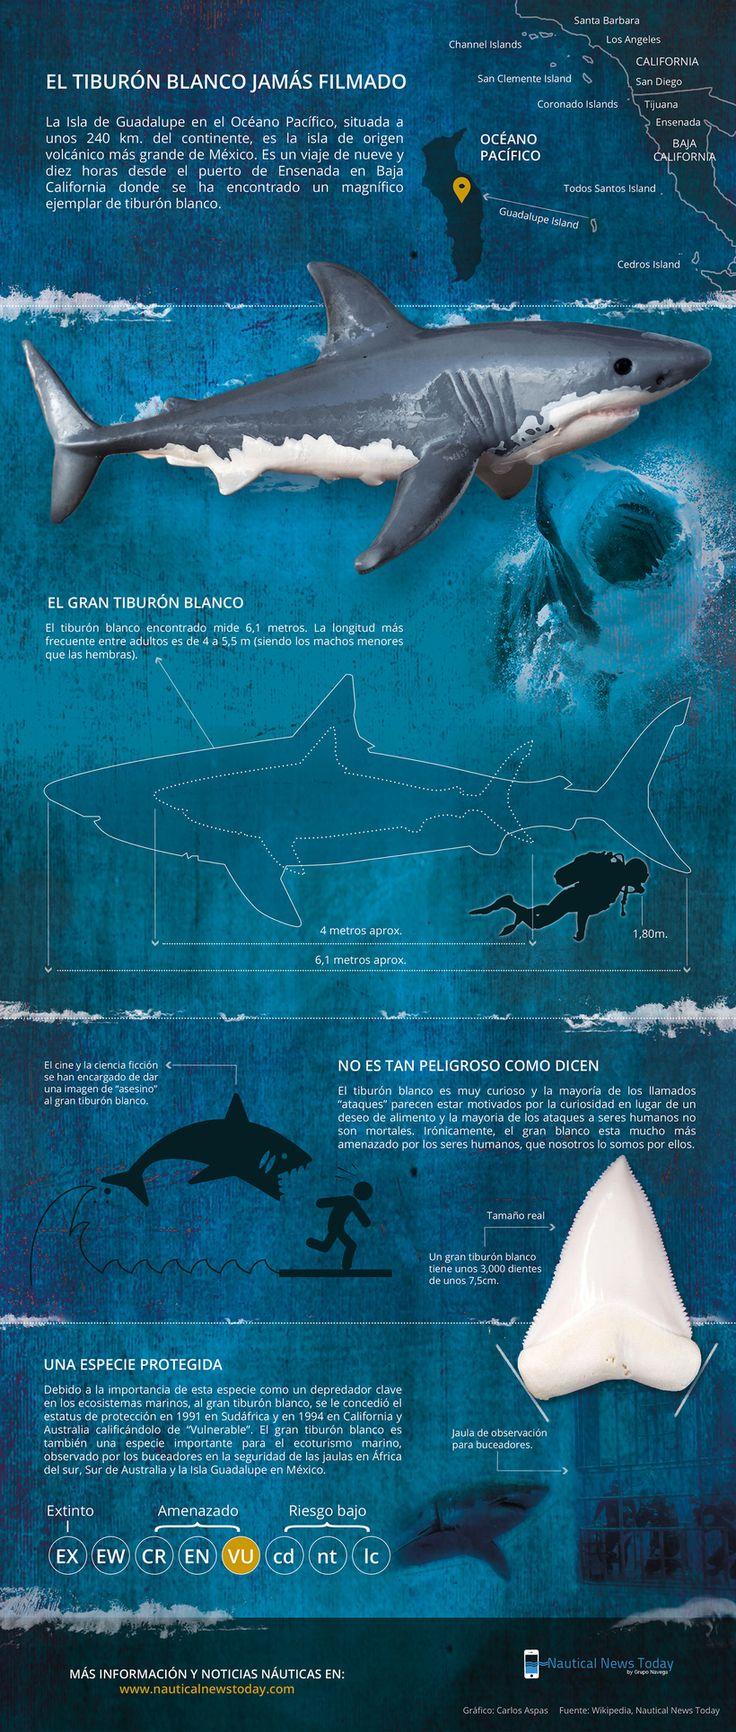 10 best tiburones images on Pinterest   Tiburones, Animales y ...